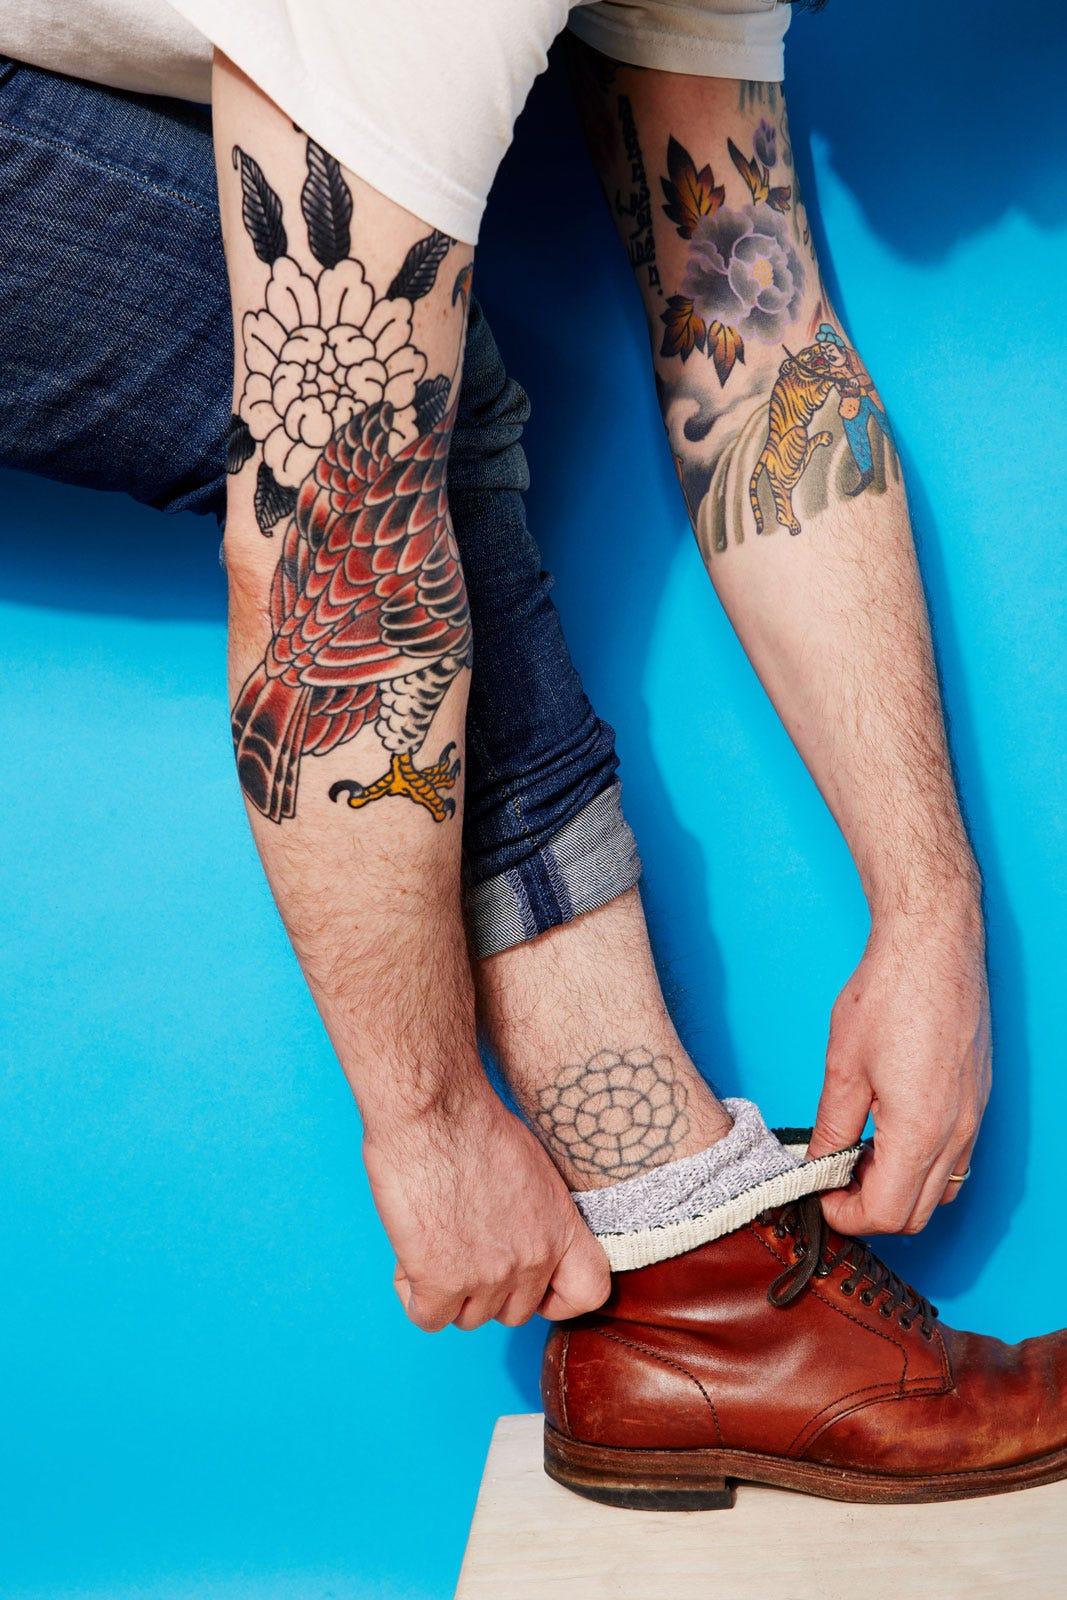 Coolest Tattoos Body Art Design Ideas Photos